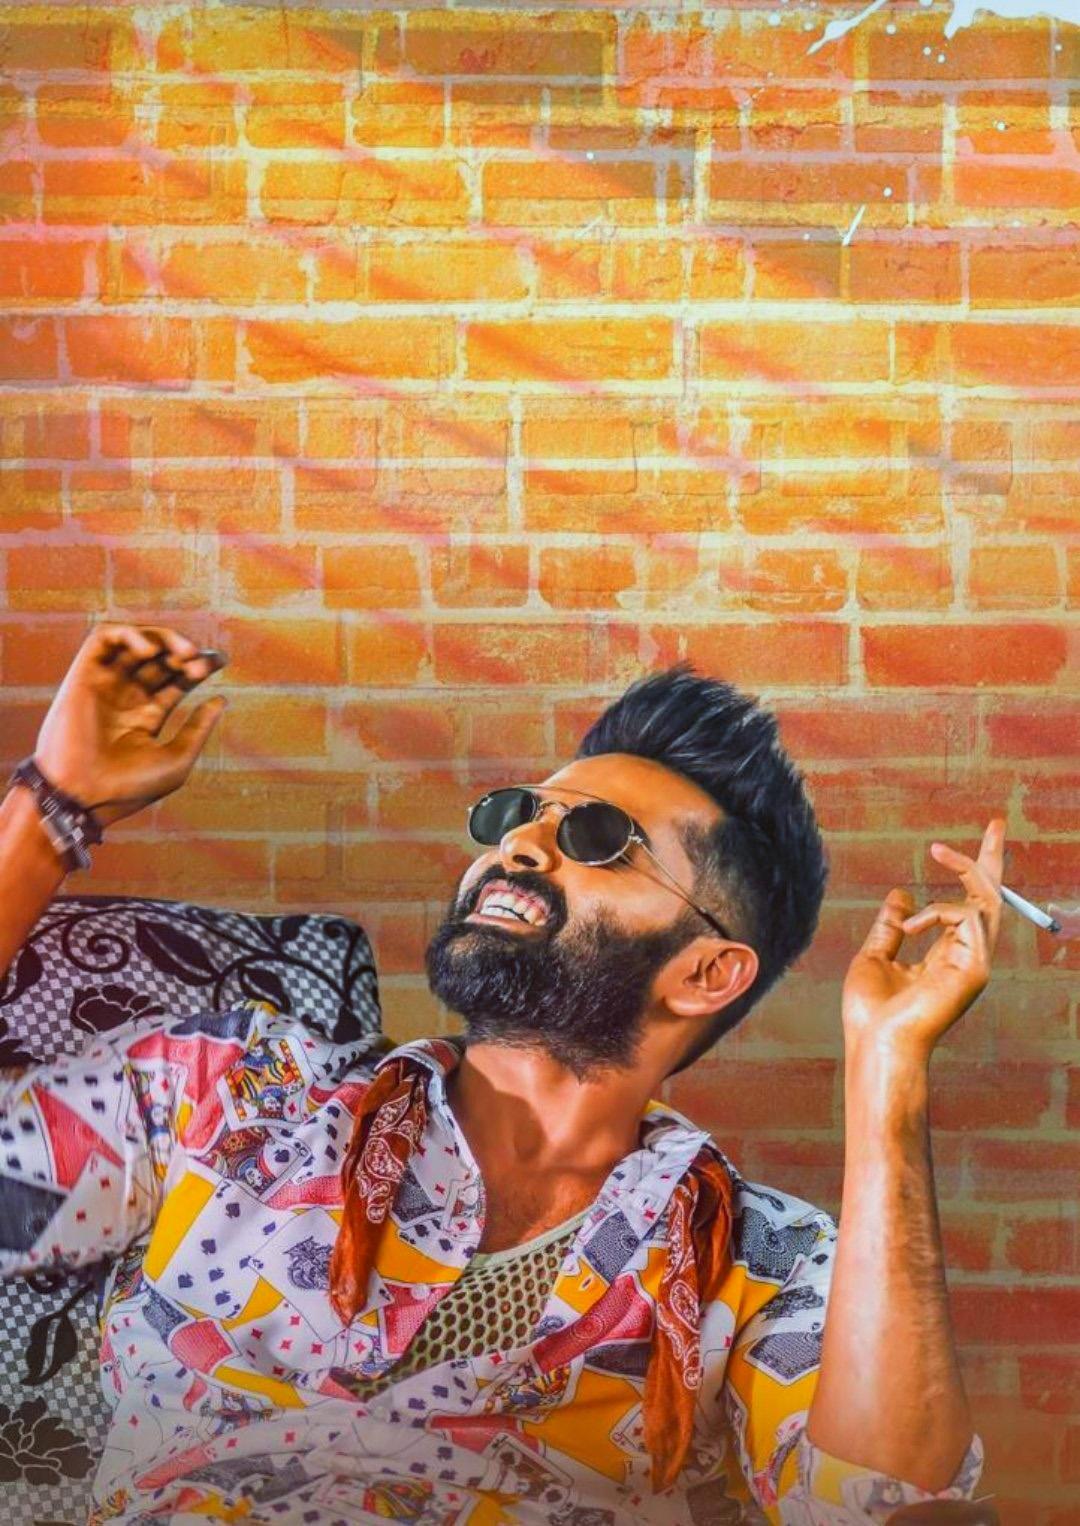 Ismart Shankar Hd Wallpapers 2019